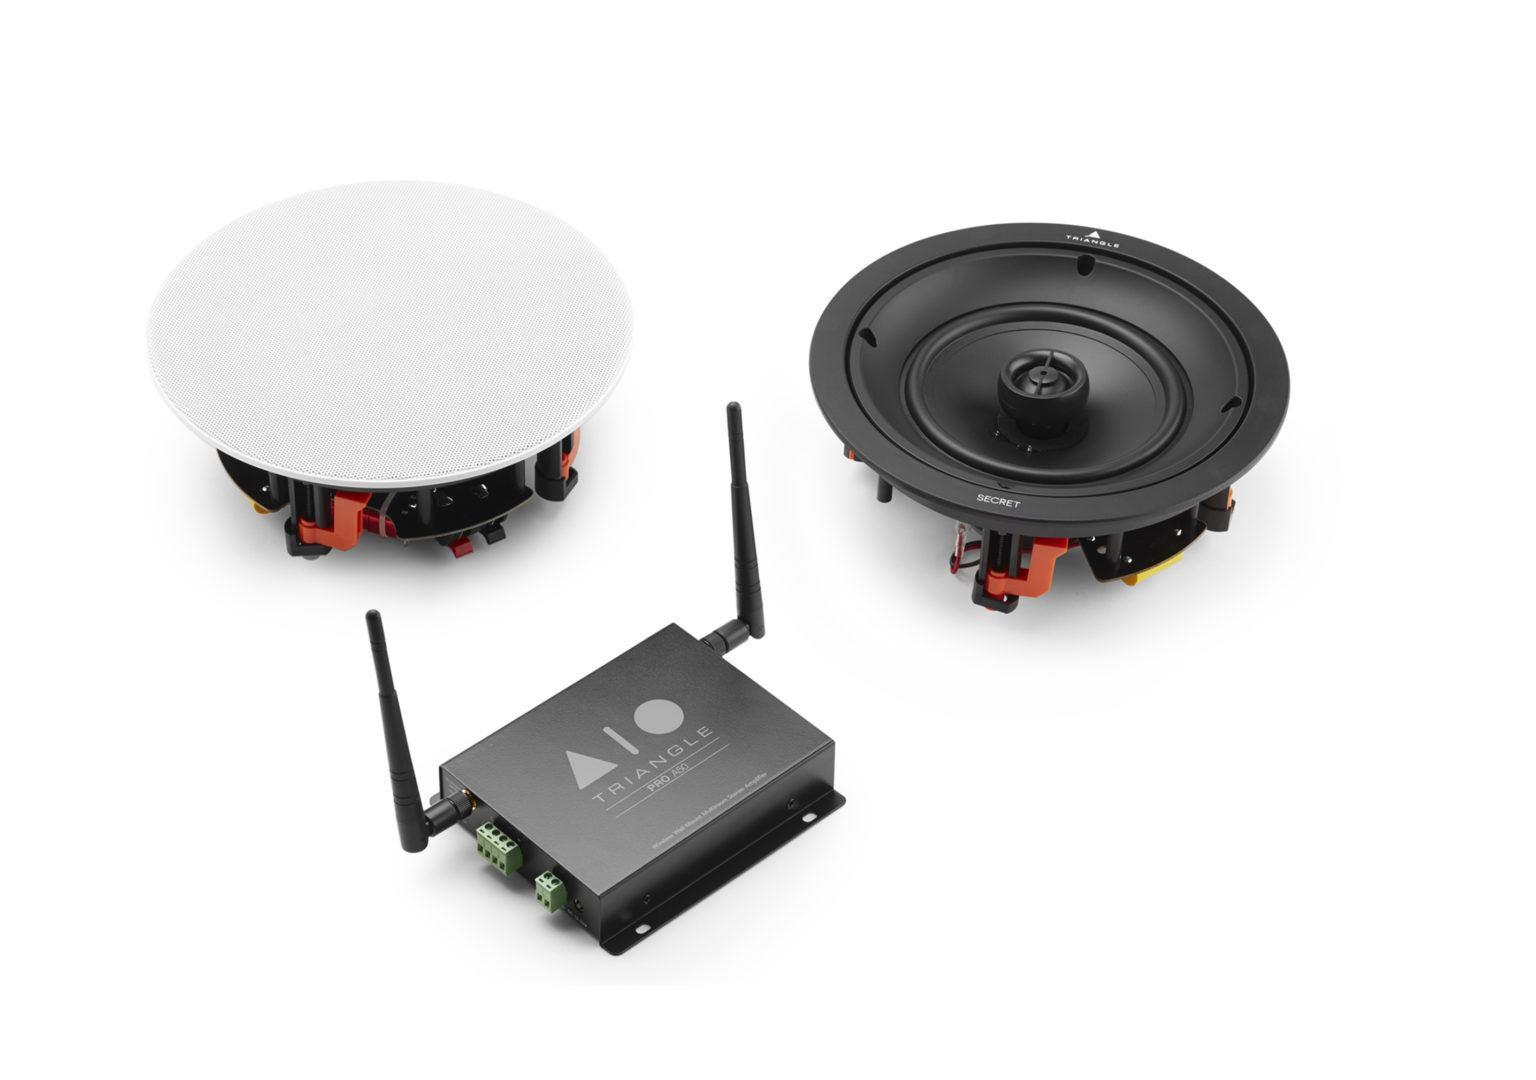 Système Enceinte connectée bluetooth wifi hifi triangle AIO Pro a50 secret packshot gamme